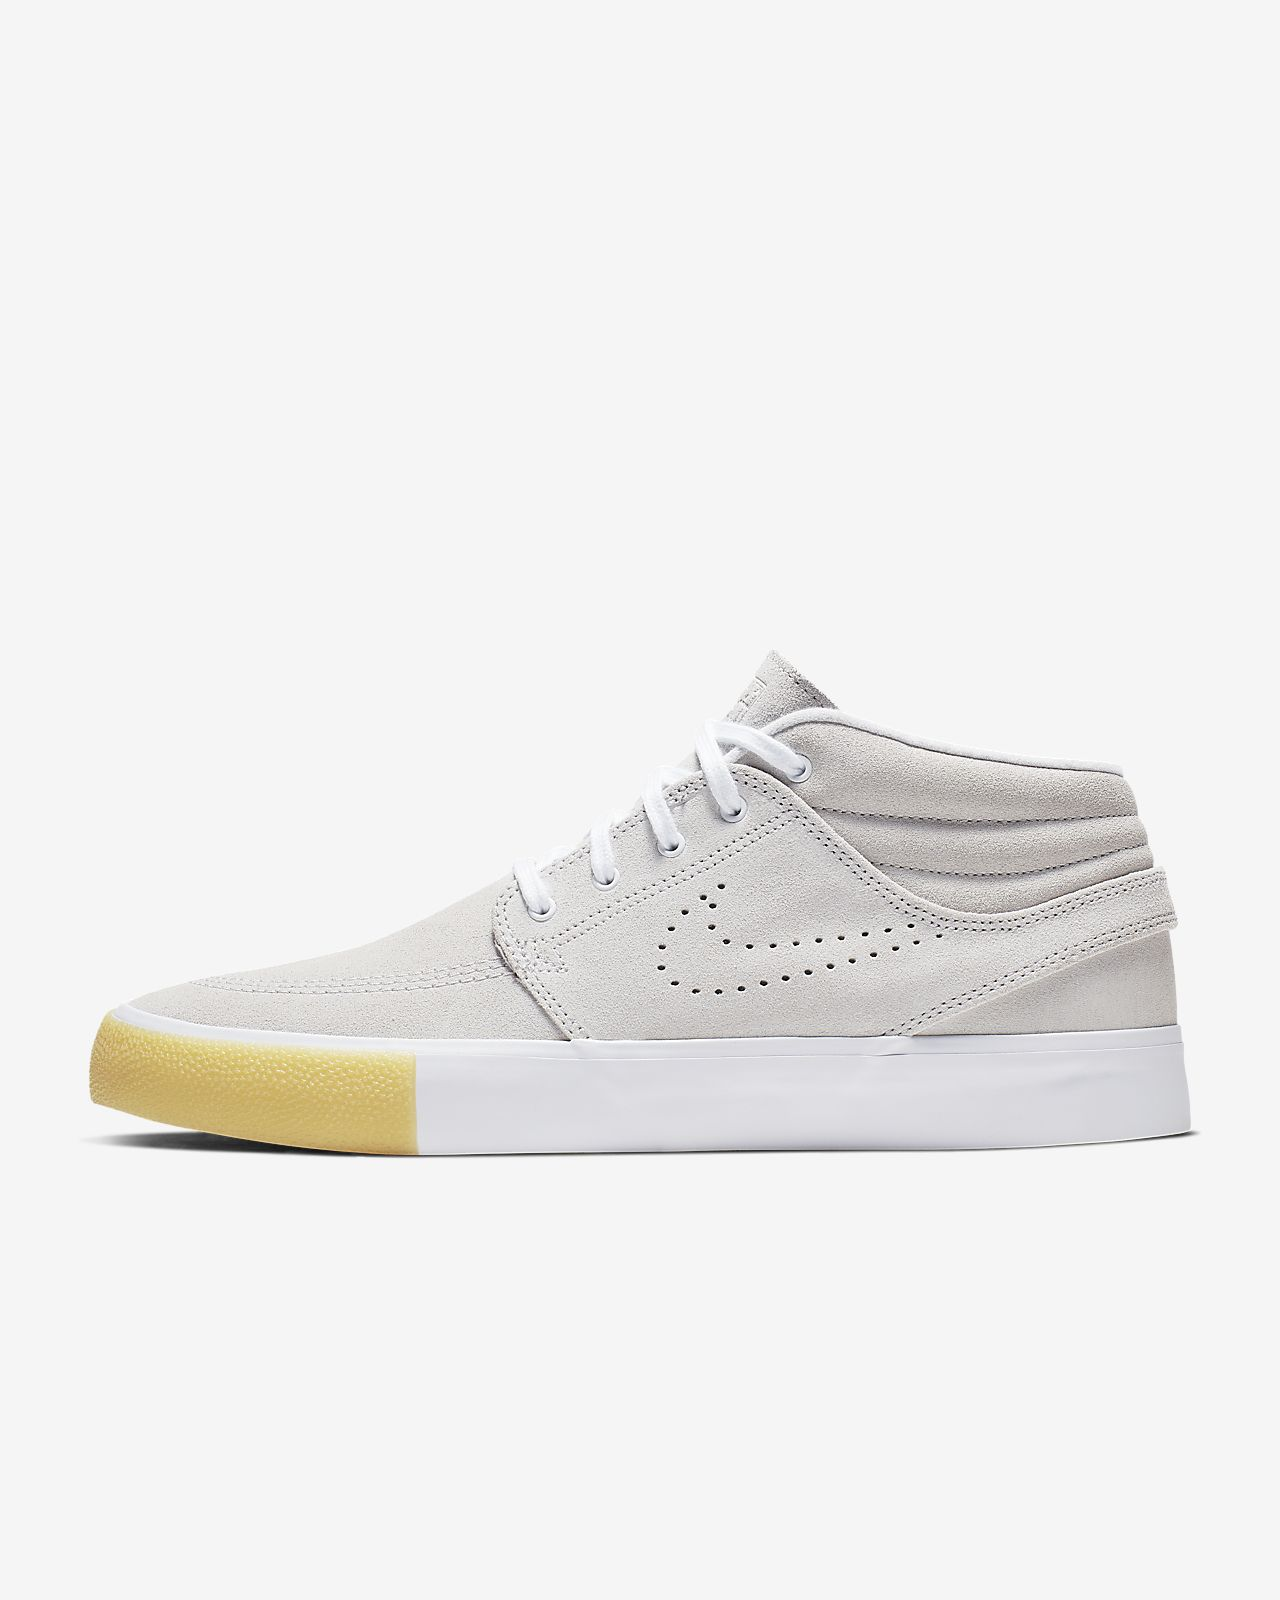 Chaussure de skateboard Nike SB Zoom Janoski Mid RM SE